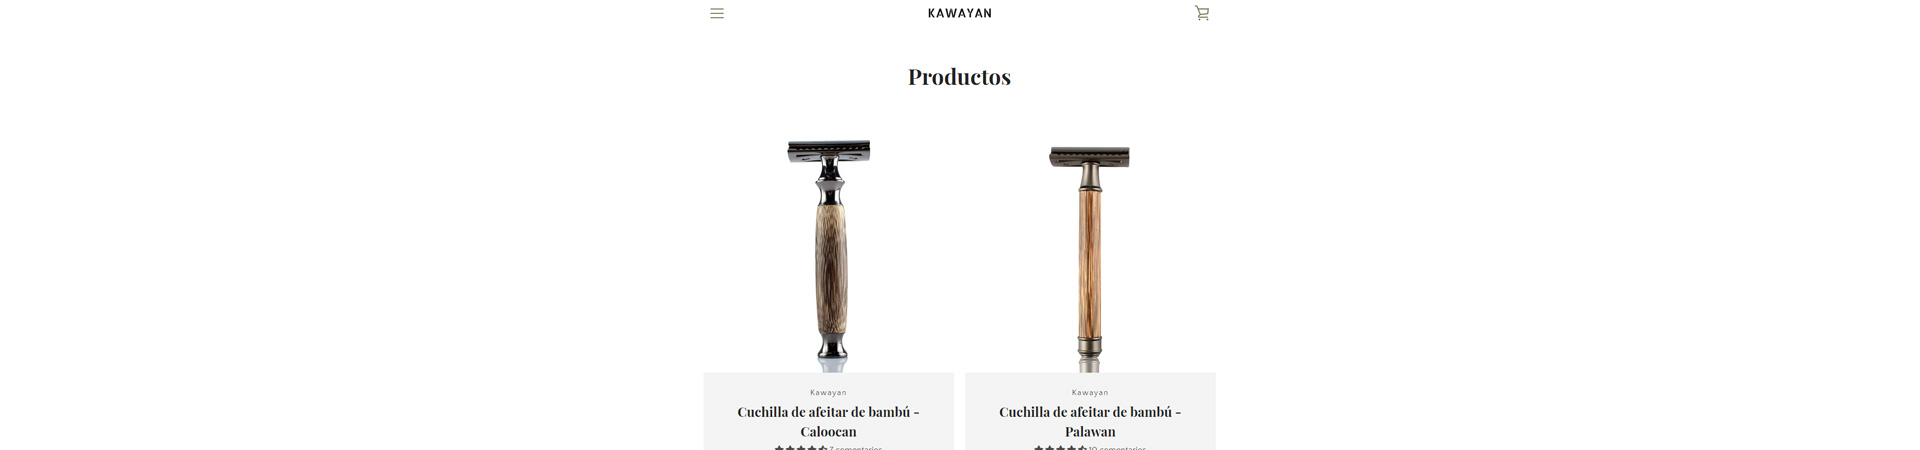 Kawayk Brand, tienda online de cuchillas de afeitar